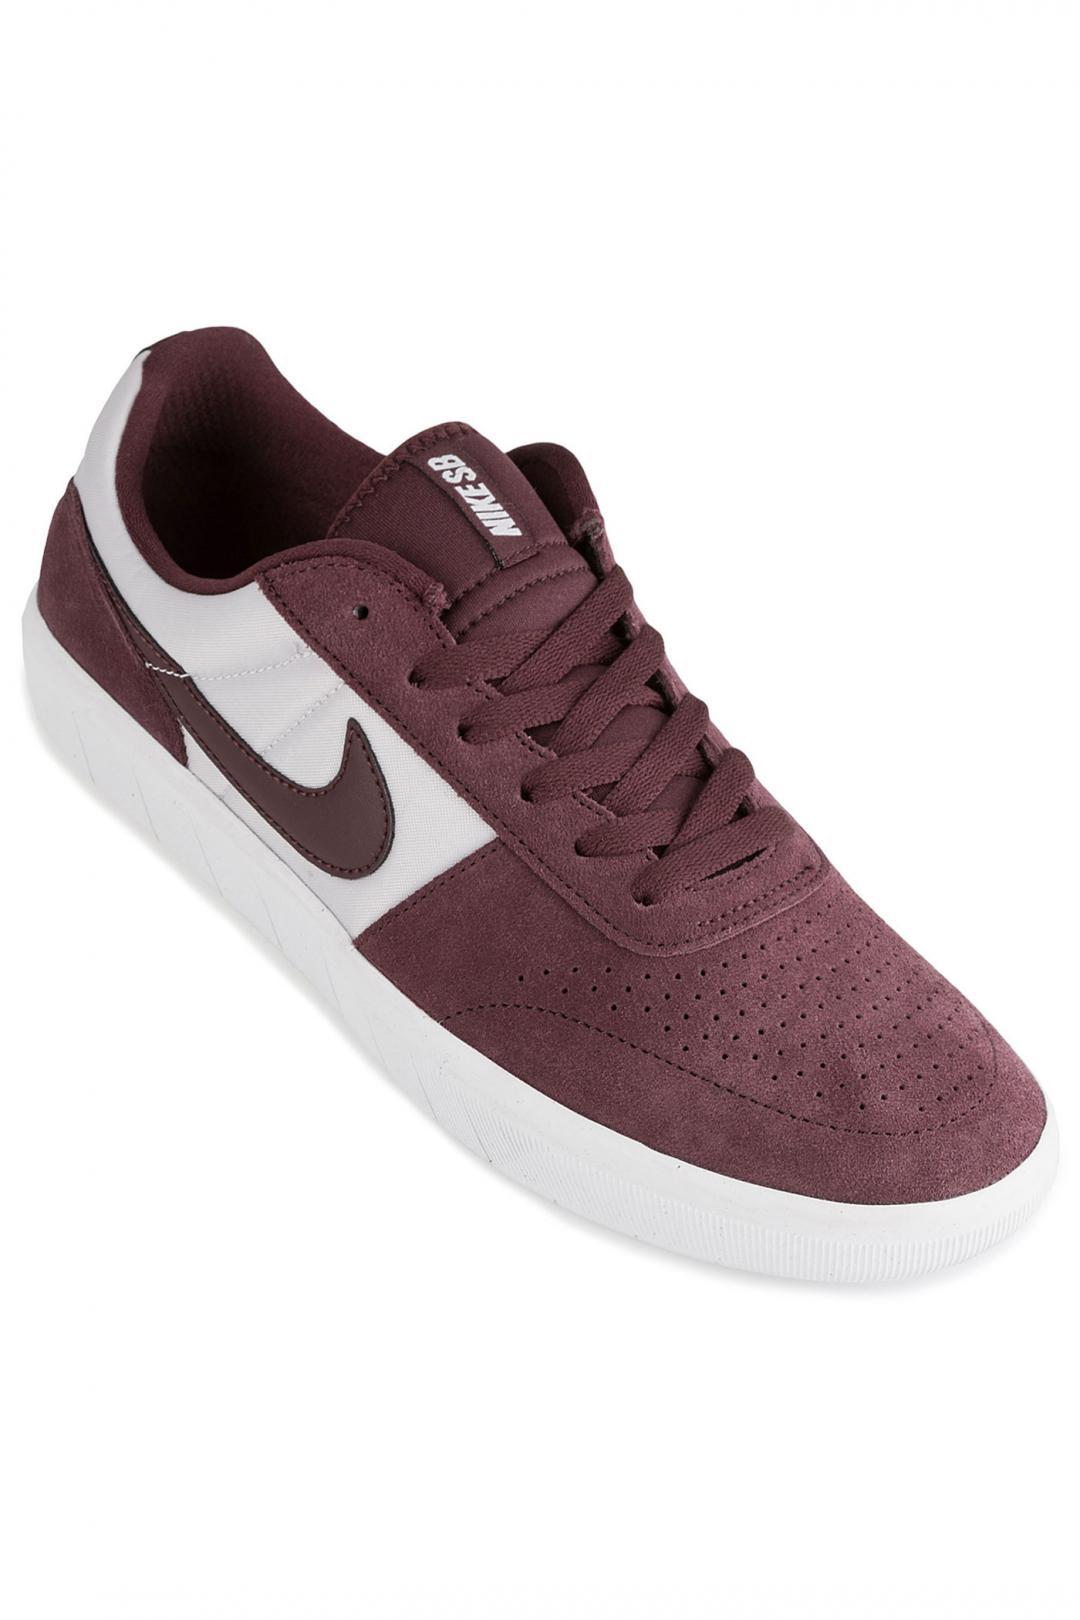 Uomo Nike SB Team Classic burgundy crush white   Sneakers low top